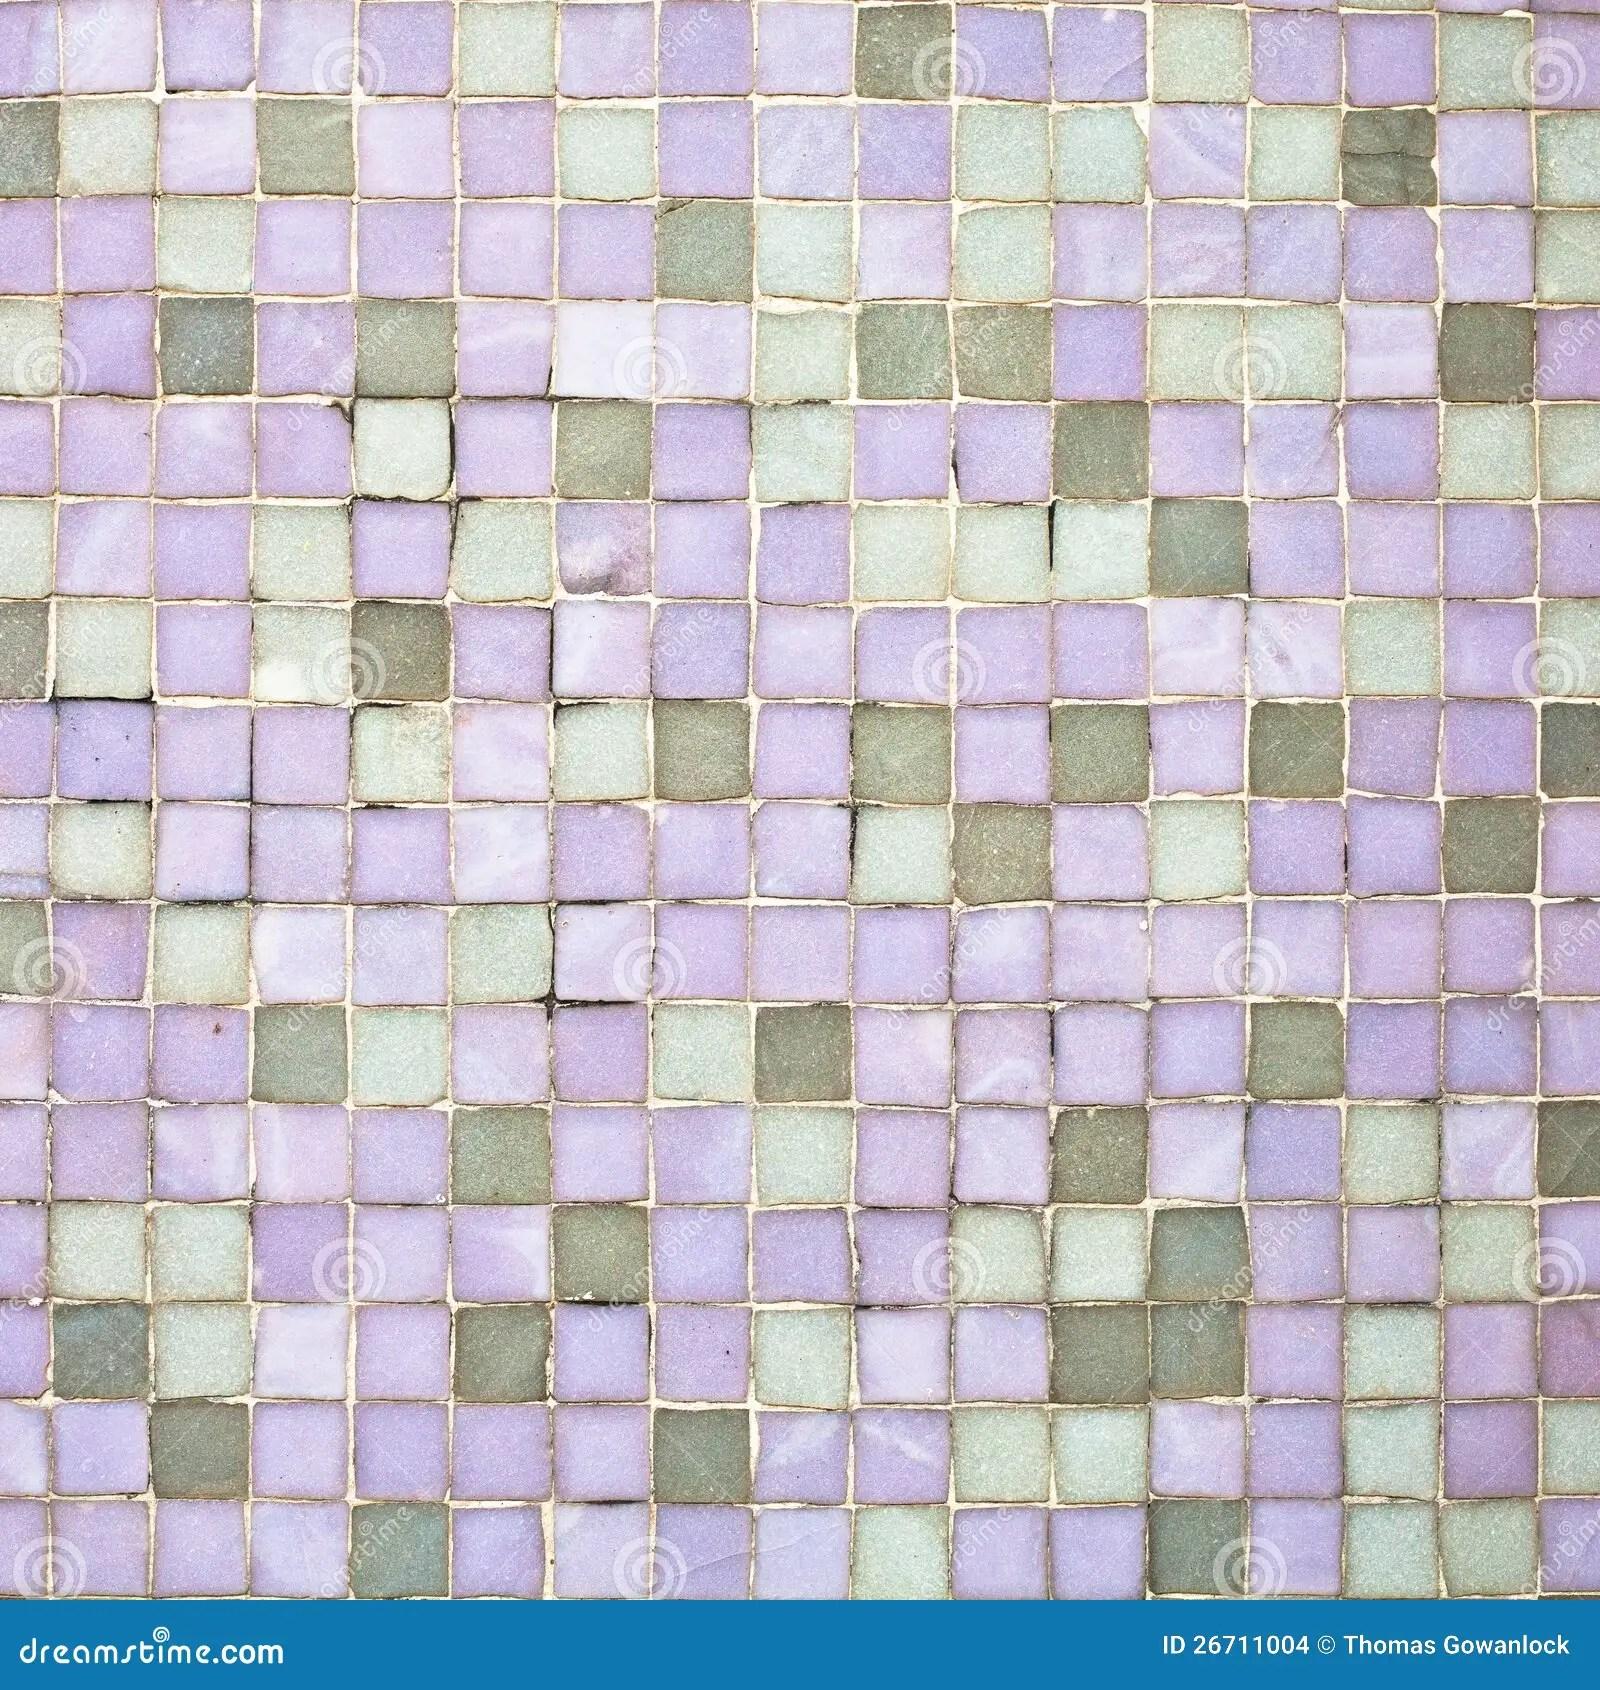 cement tile kitchen live edge table 紫色瓦片库存照片 图片包括有黏土 正常 灰色 厨房 紫罗兰色 水泥 紫色瓦片